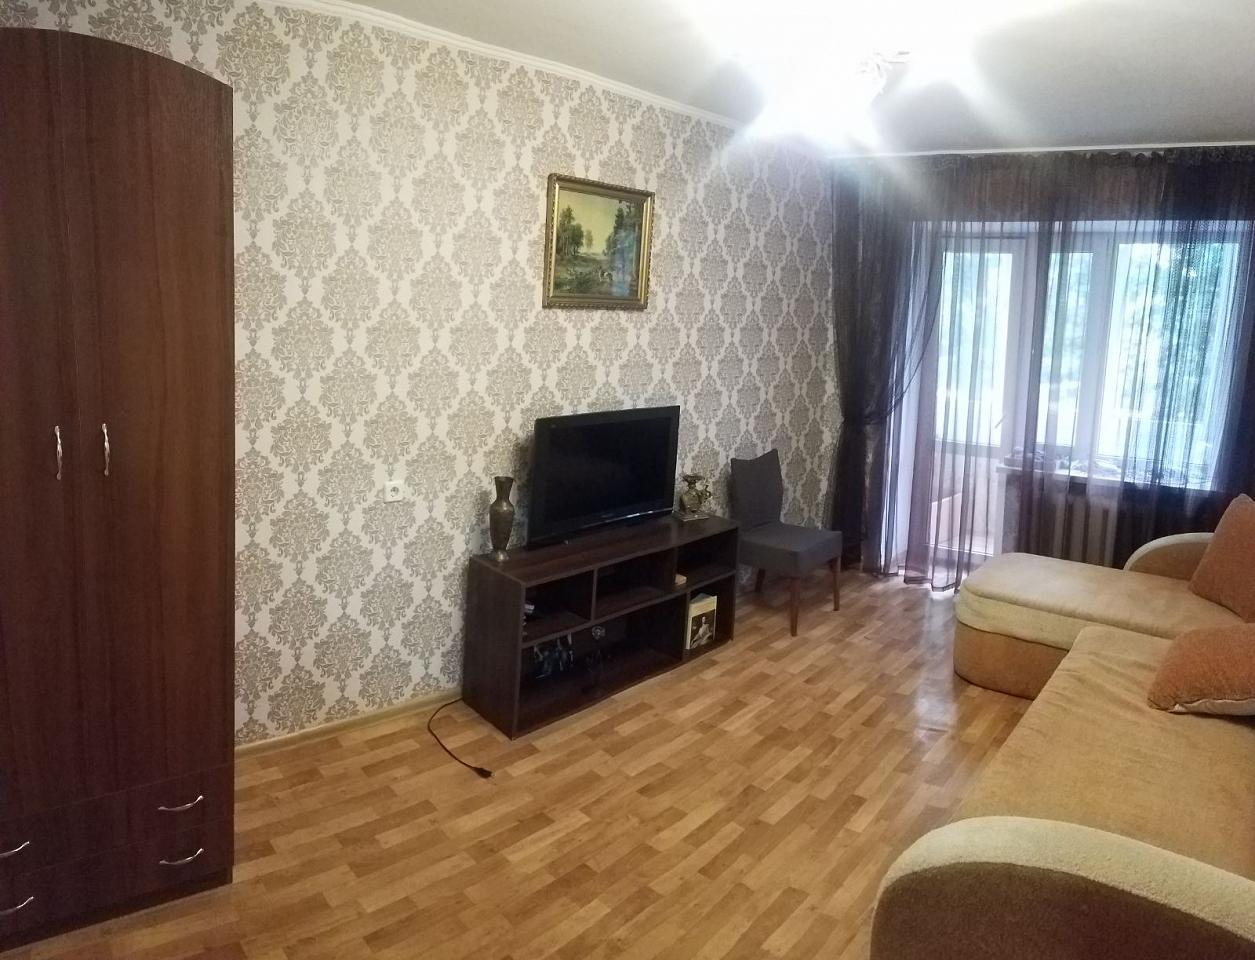 2-х комнатная квартира в 15 мин.хотьбы до моря